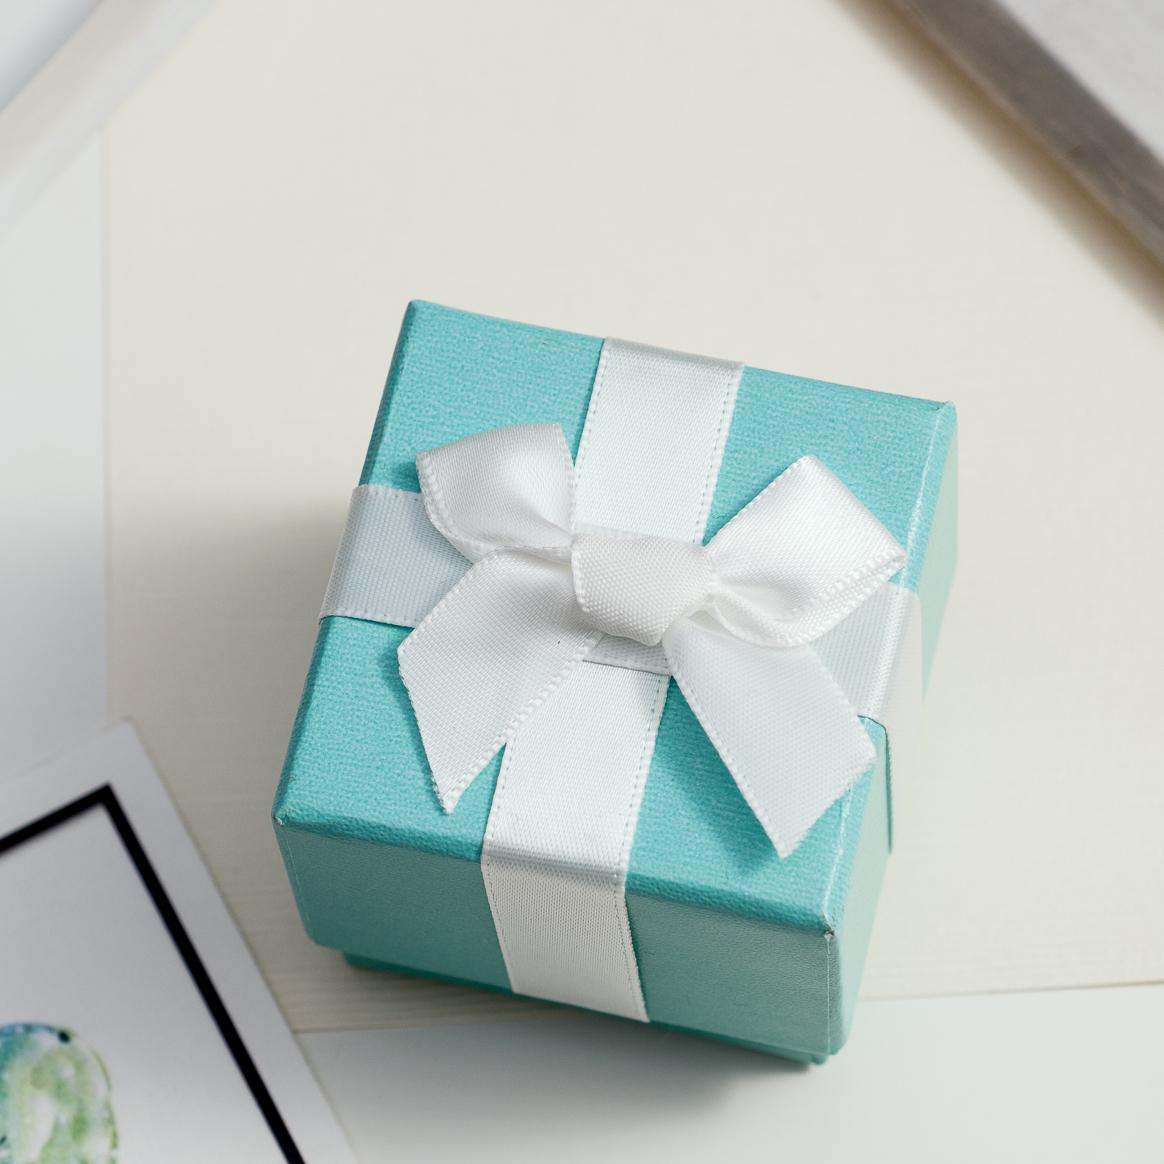 禮物盒-緞帶蝴蝶結Tiffany綠盒